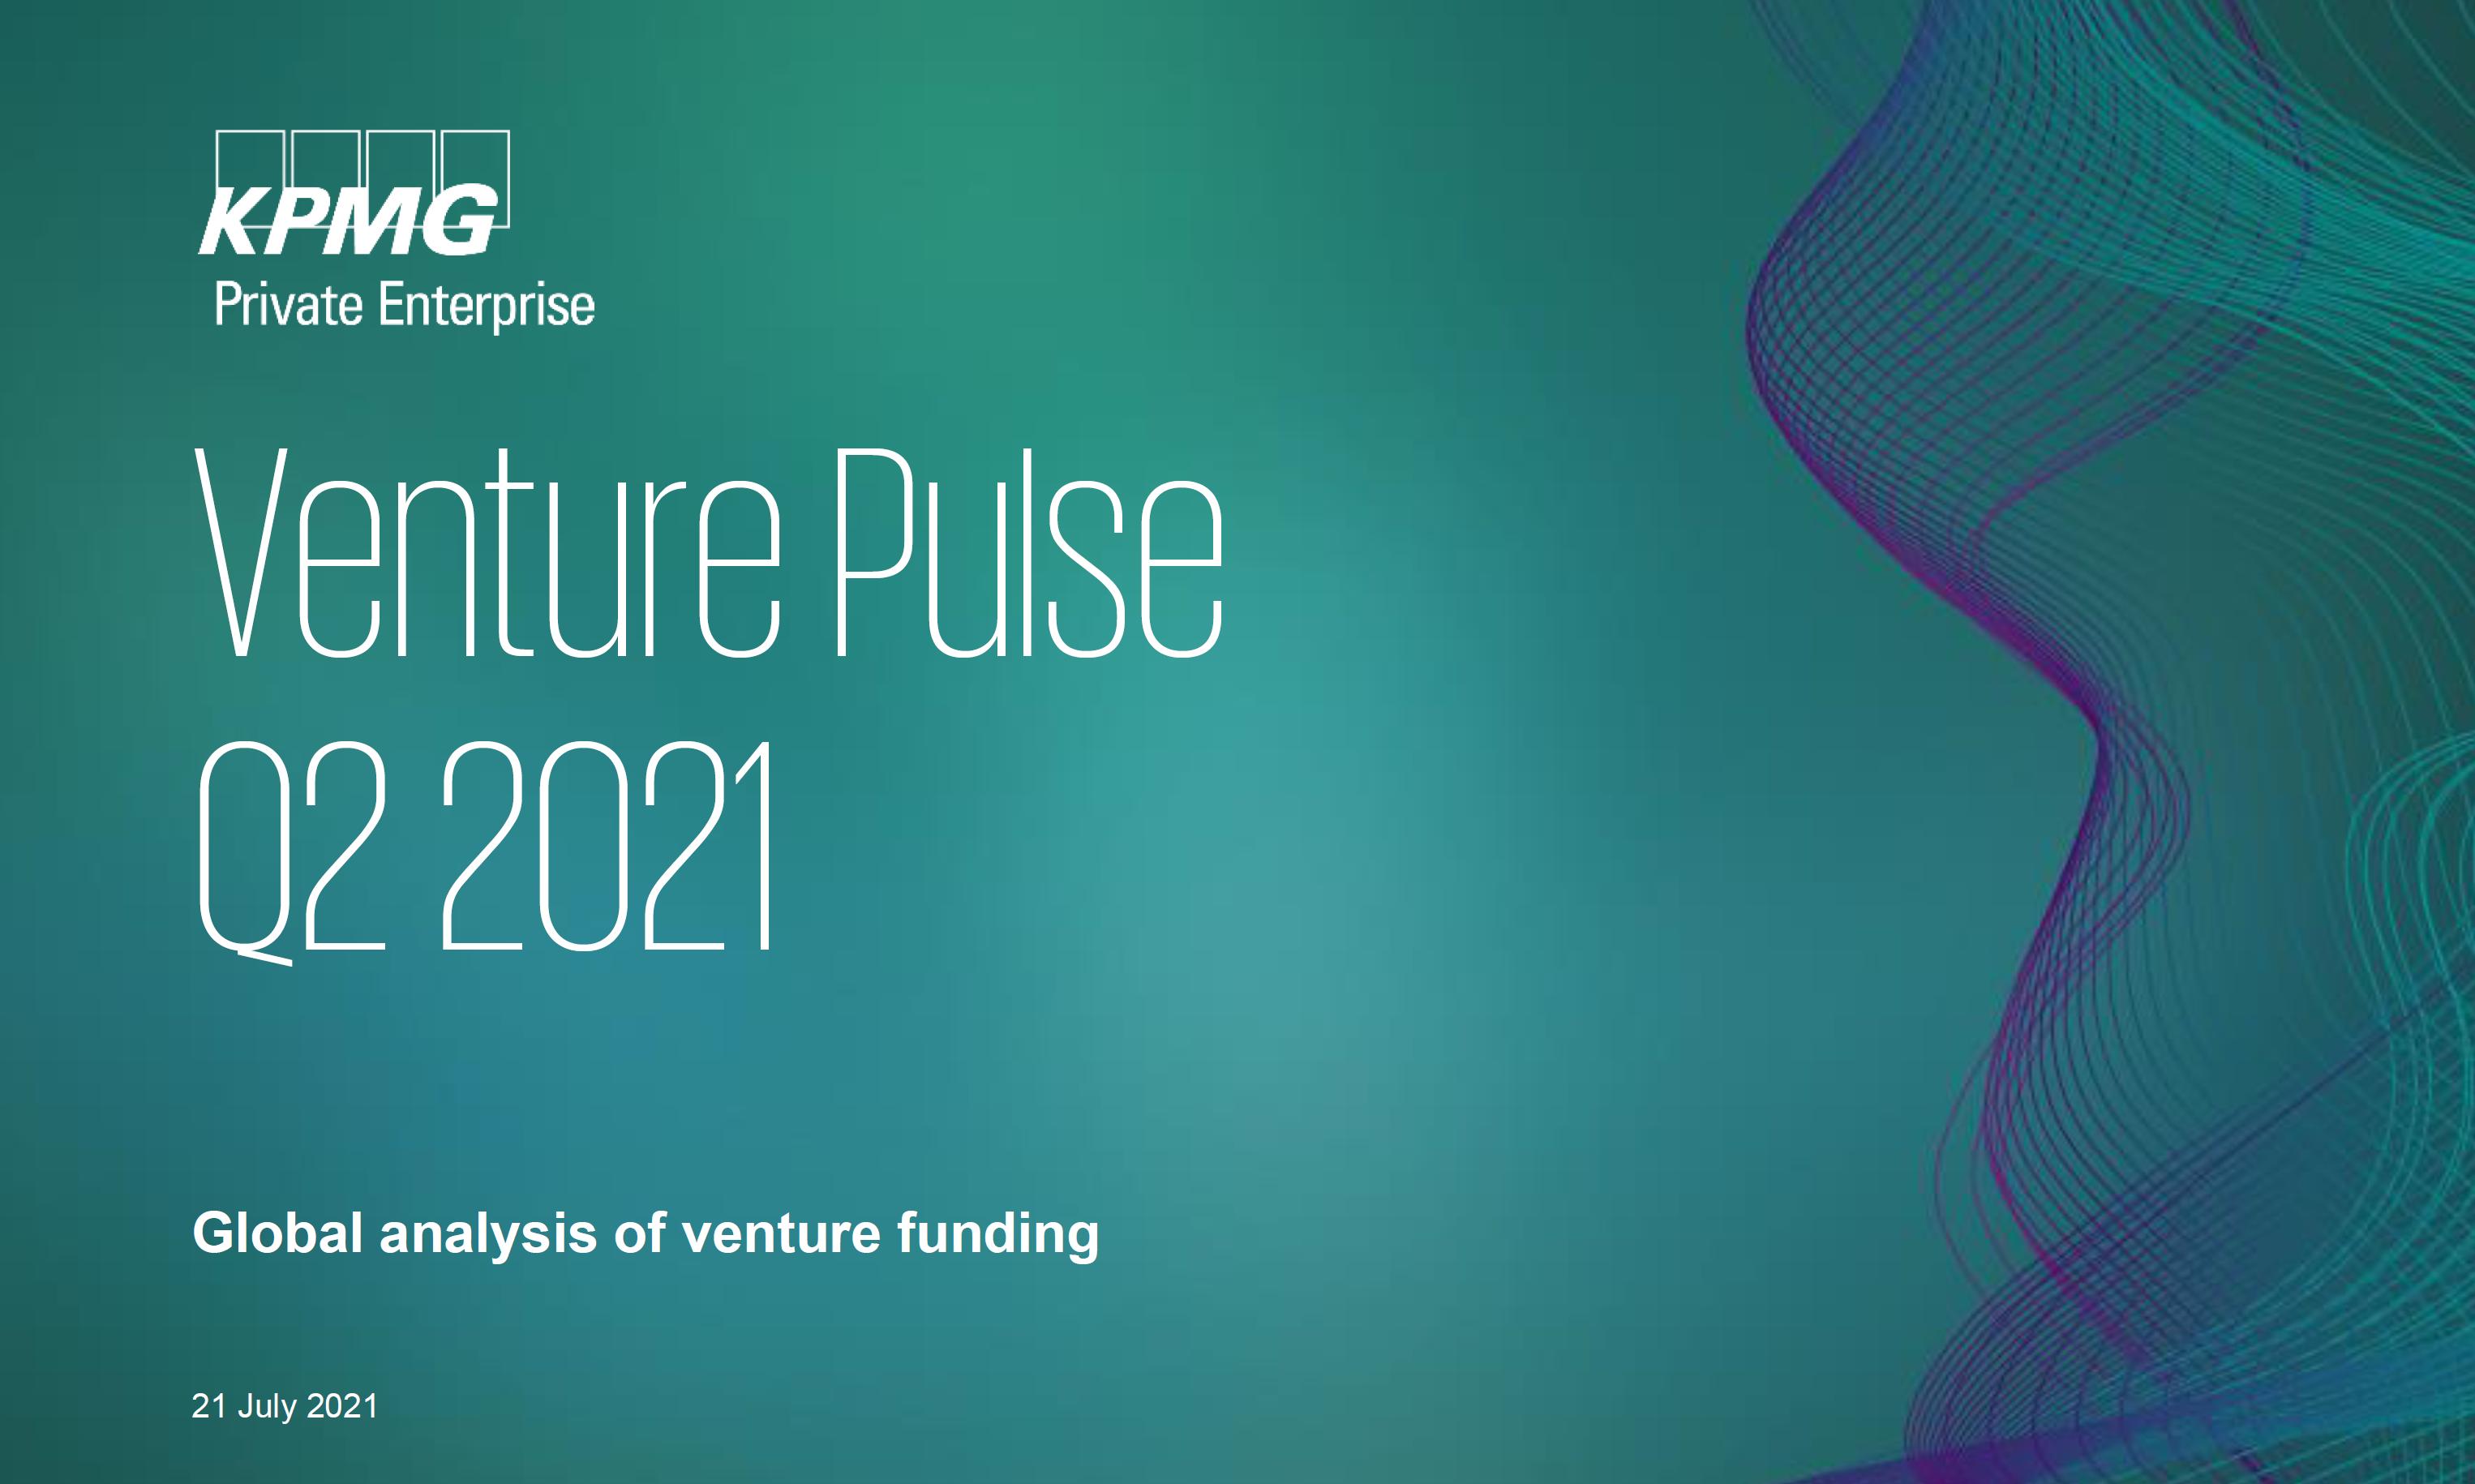 KPMG | Venture Pulse Q2 2021